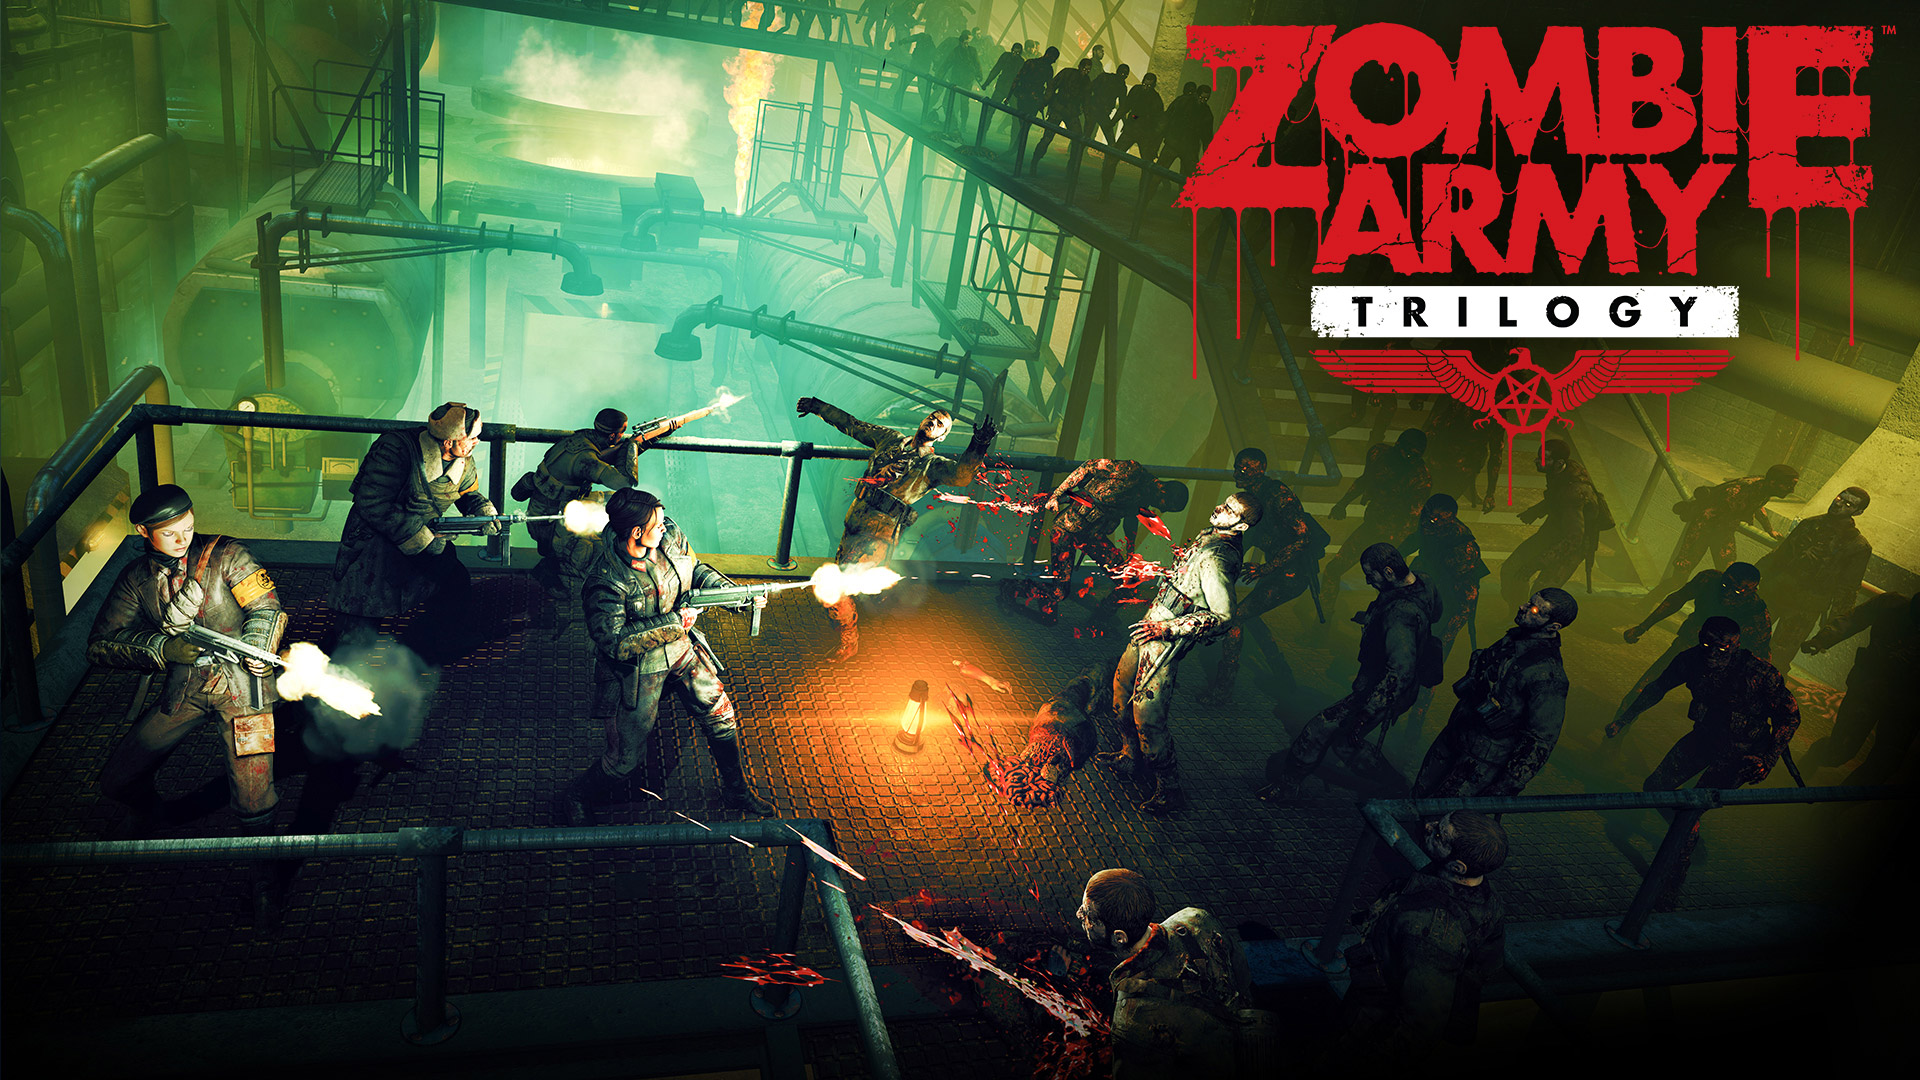 Zombie Army Trilogy Wallpaper in 1920x1080